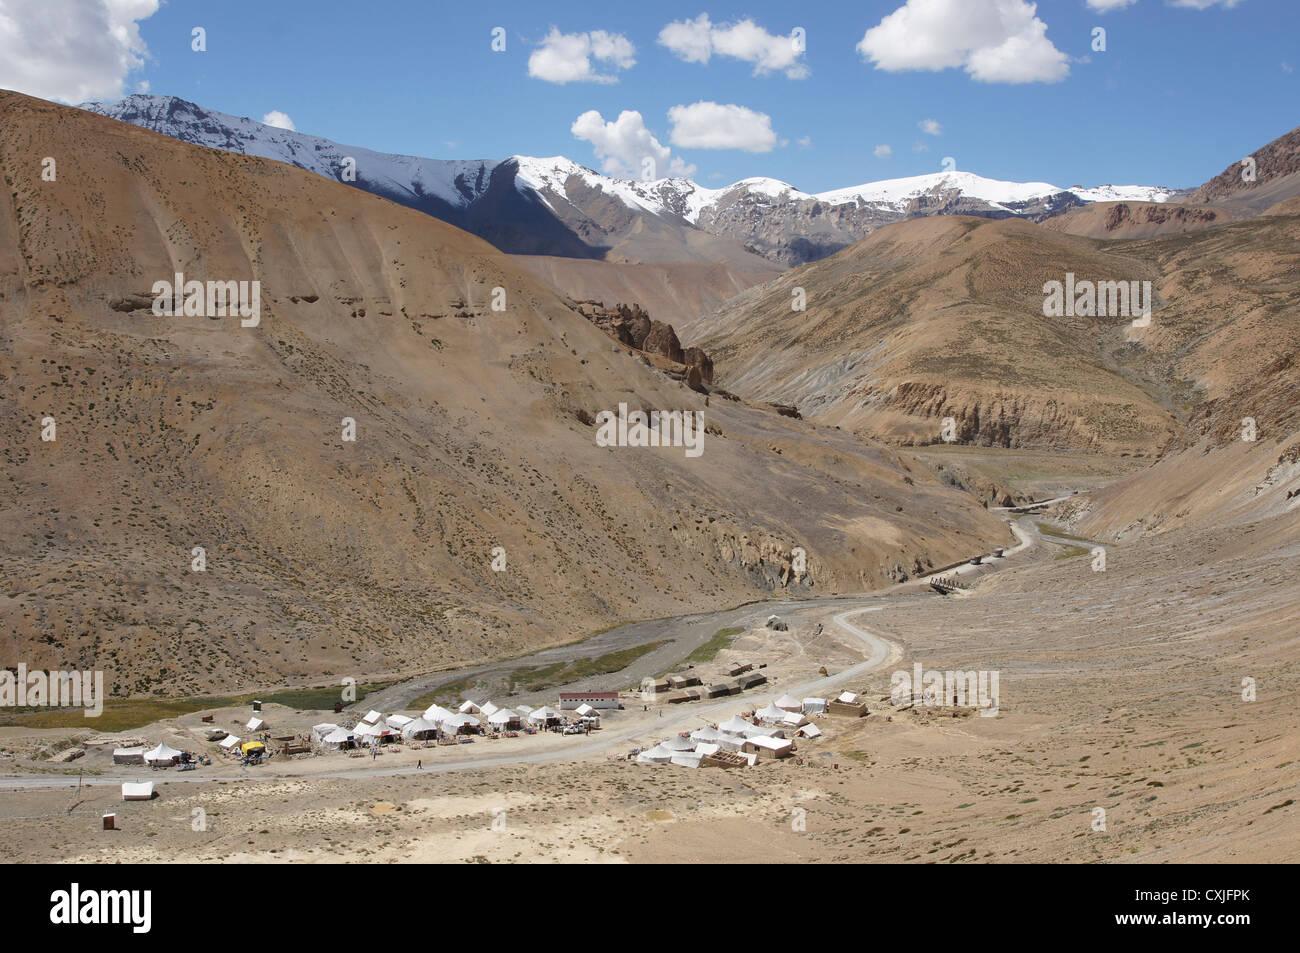 workers camp at pang, manali-leh highway, jammu and kashmir, india - Stock Image